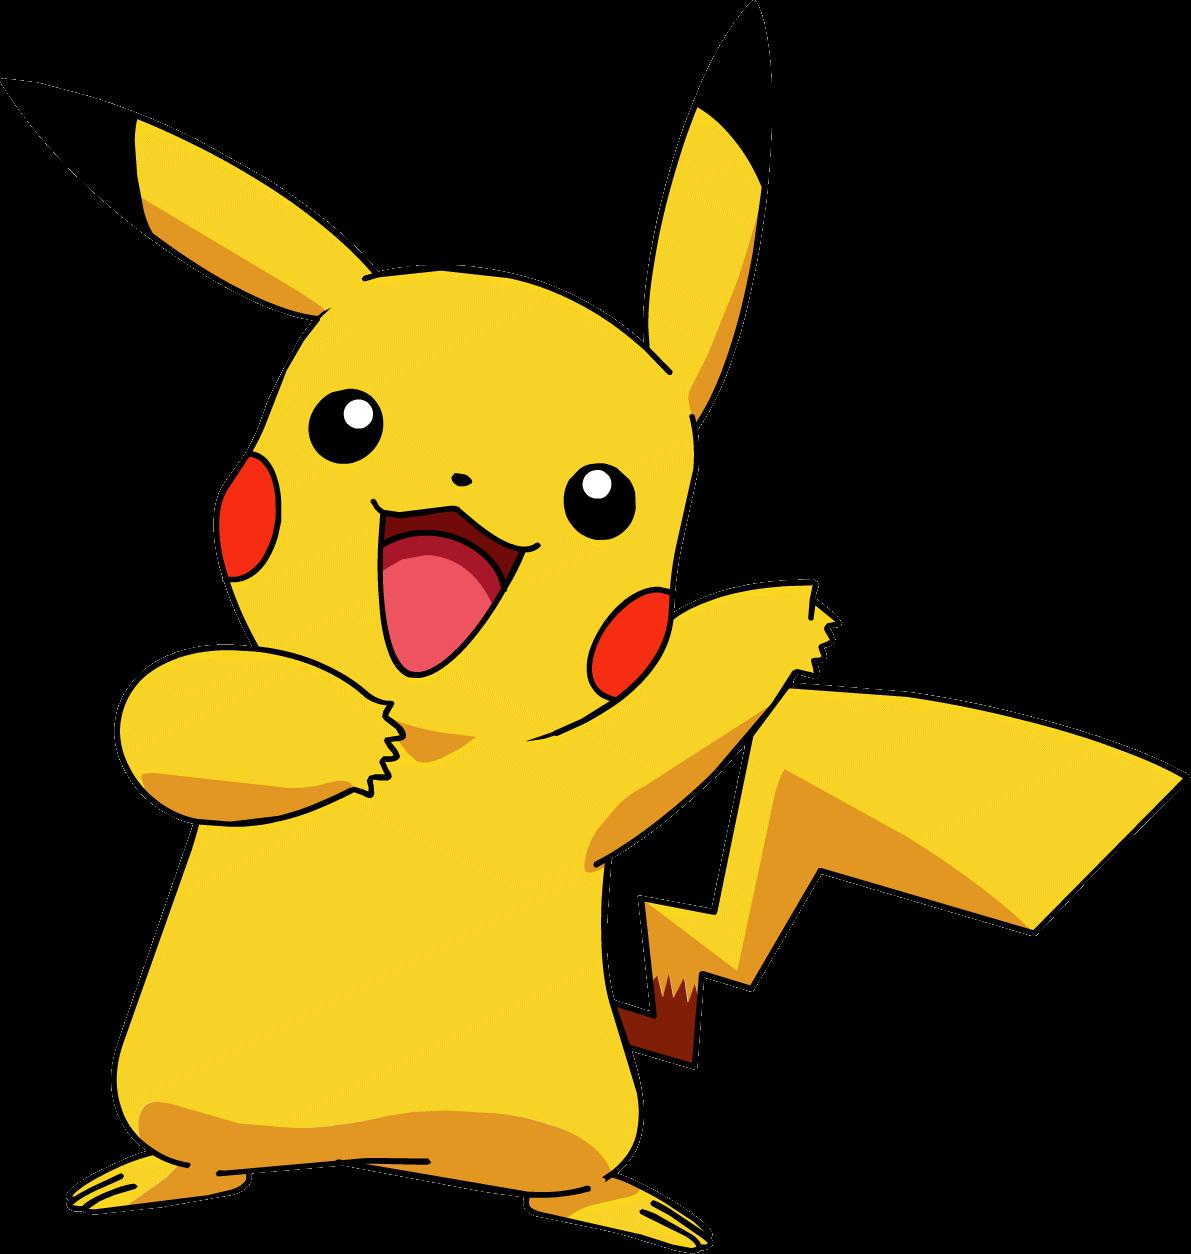 Pikachu transparent png stickpng. Pokemon clipart easy